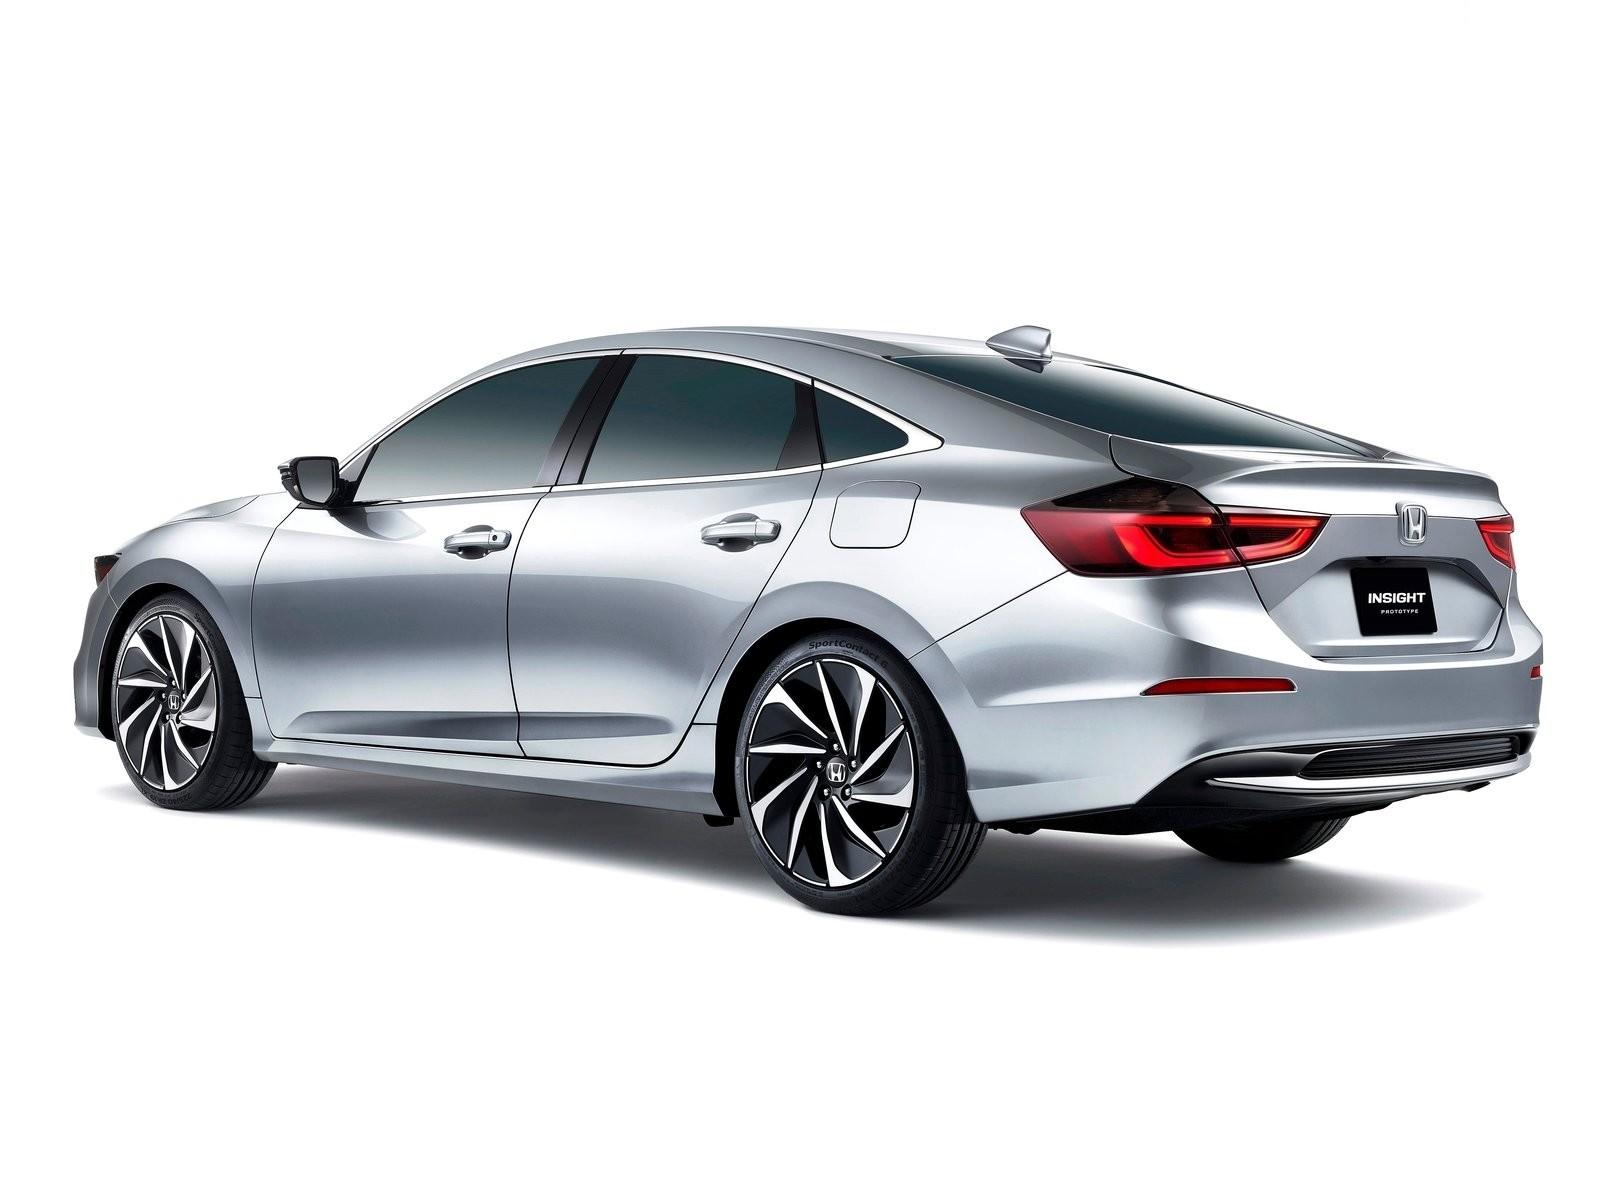 Honda Insight Concept 2018